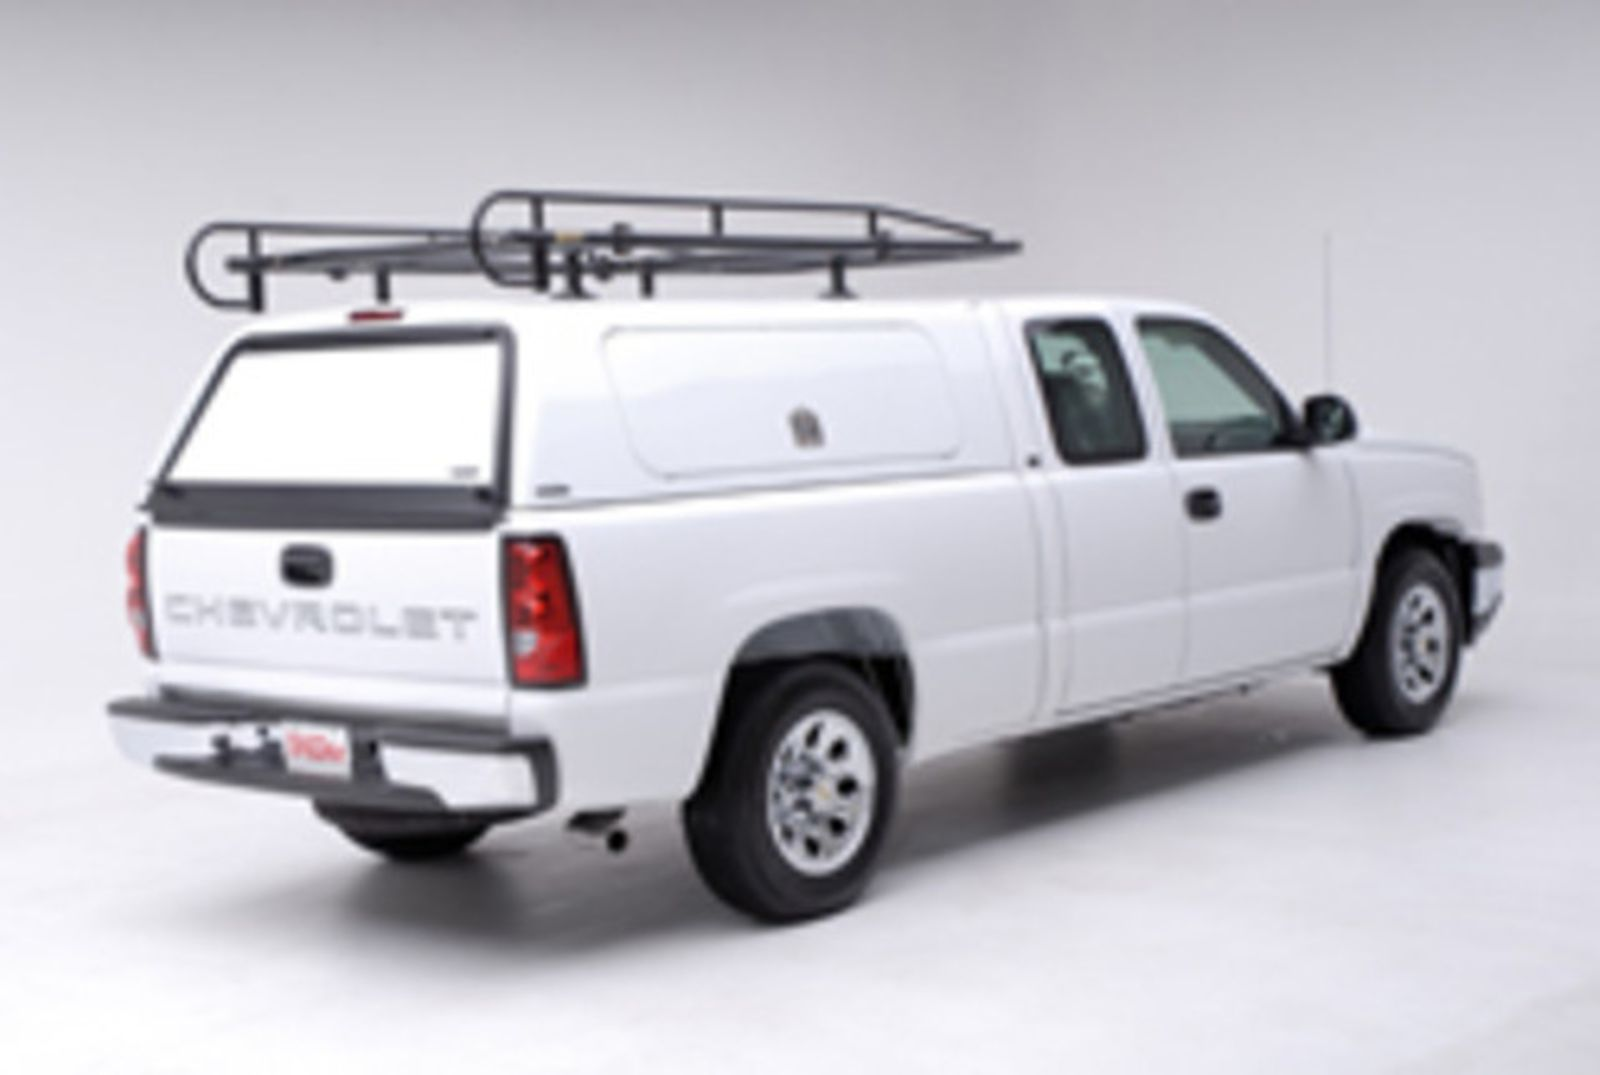 Dodge Dealer In Phoenix >> 2017 Ford Chevy Dodge Camper Shells Truck Toppers Truck Caps | Phoenix AZ 85019